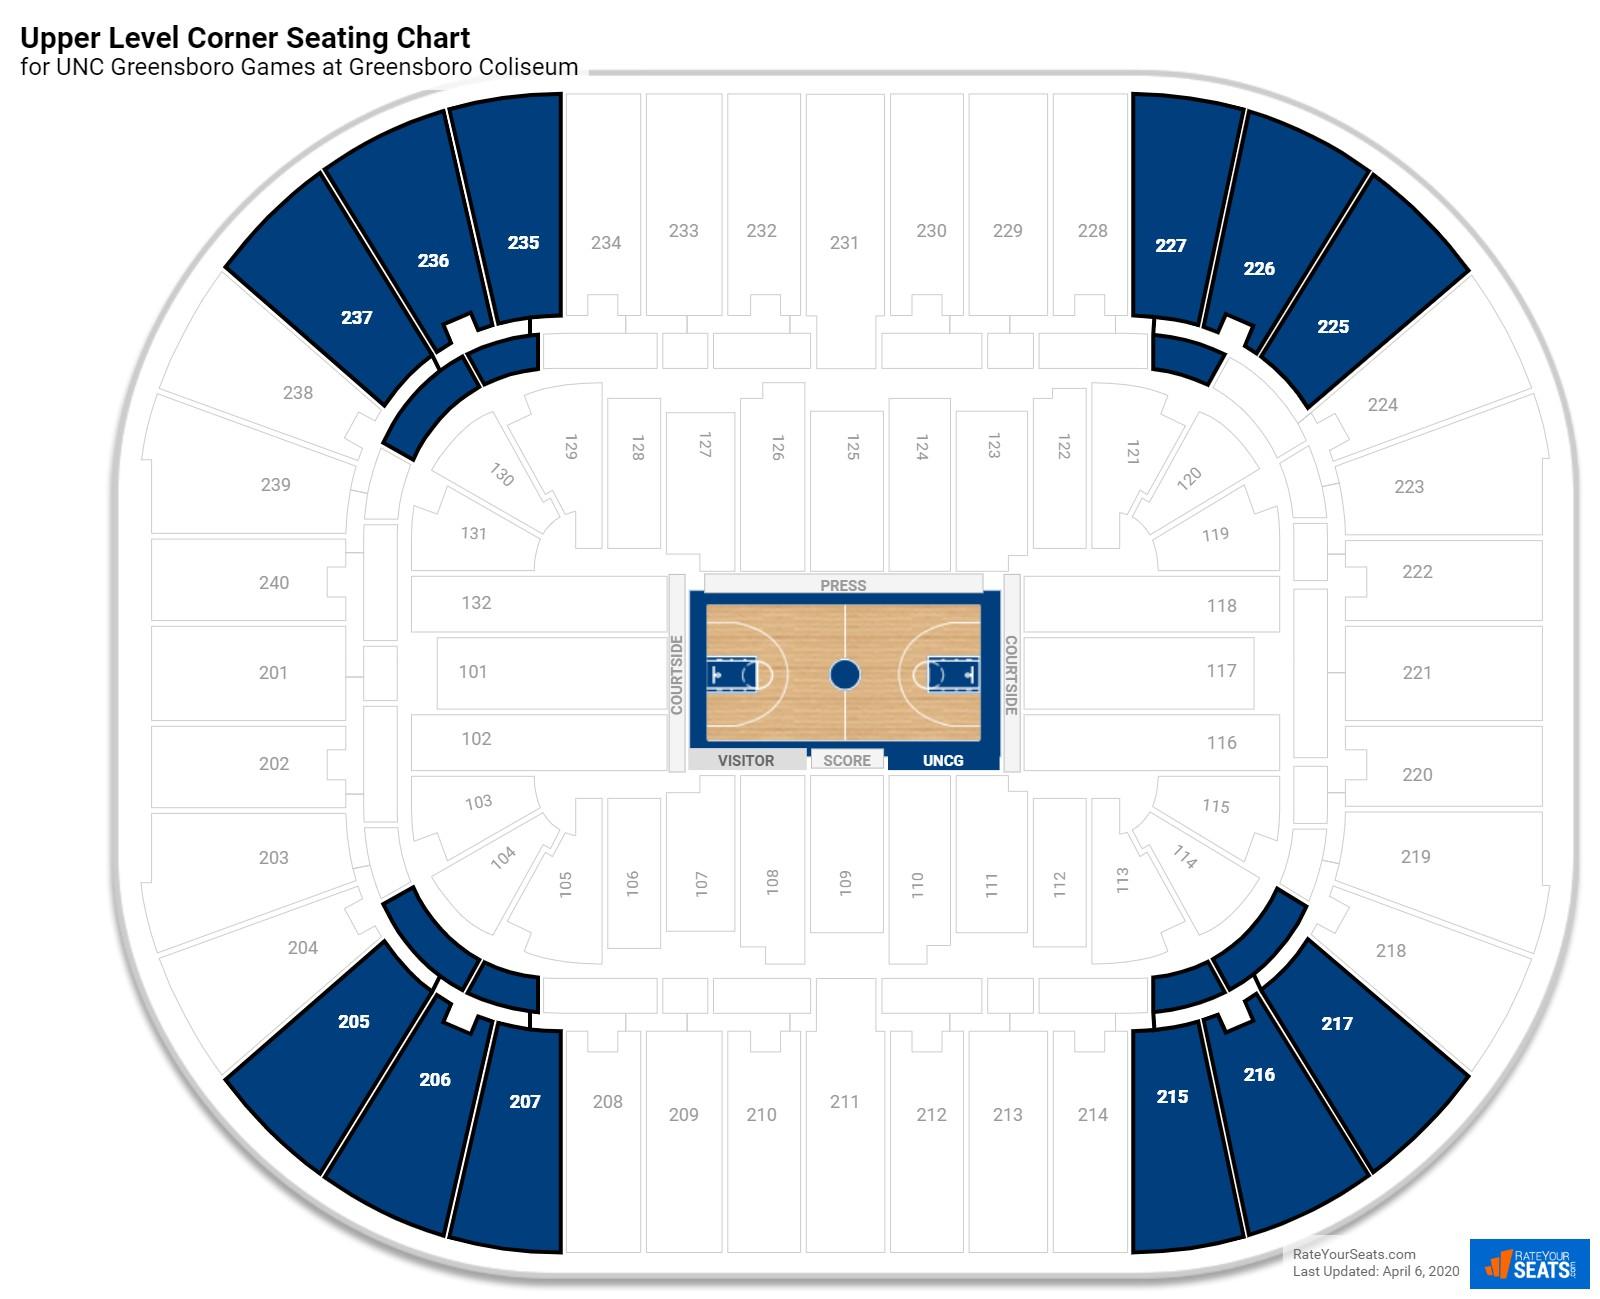 Greensboro Coliseum Upper Level Corner Seating Chart